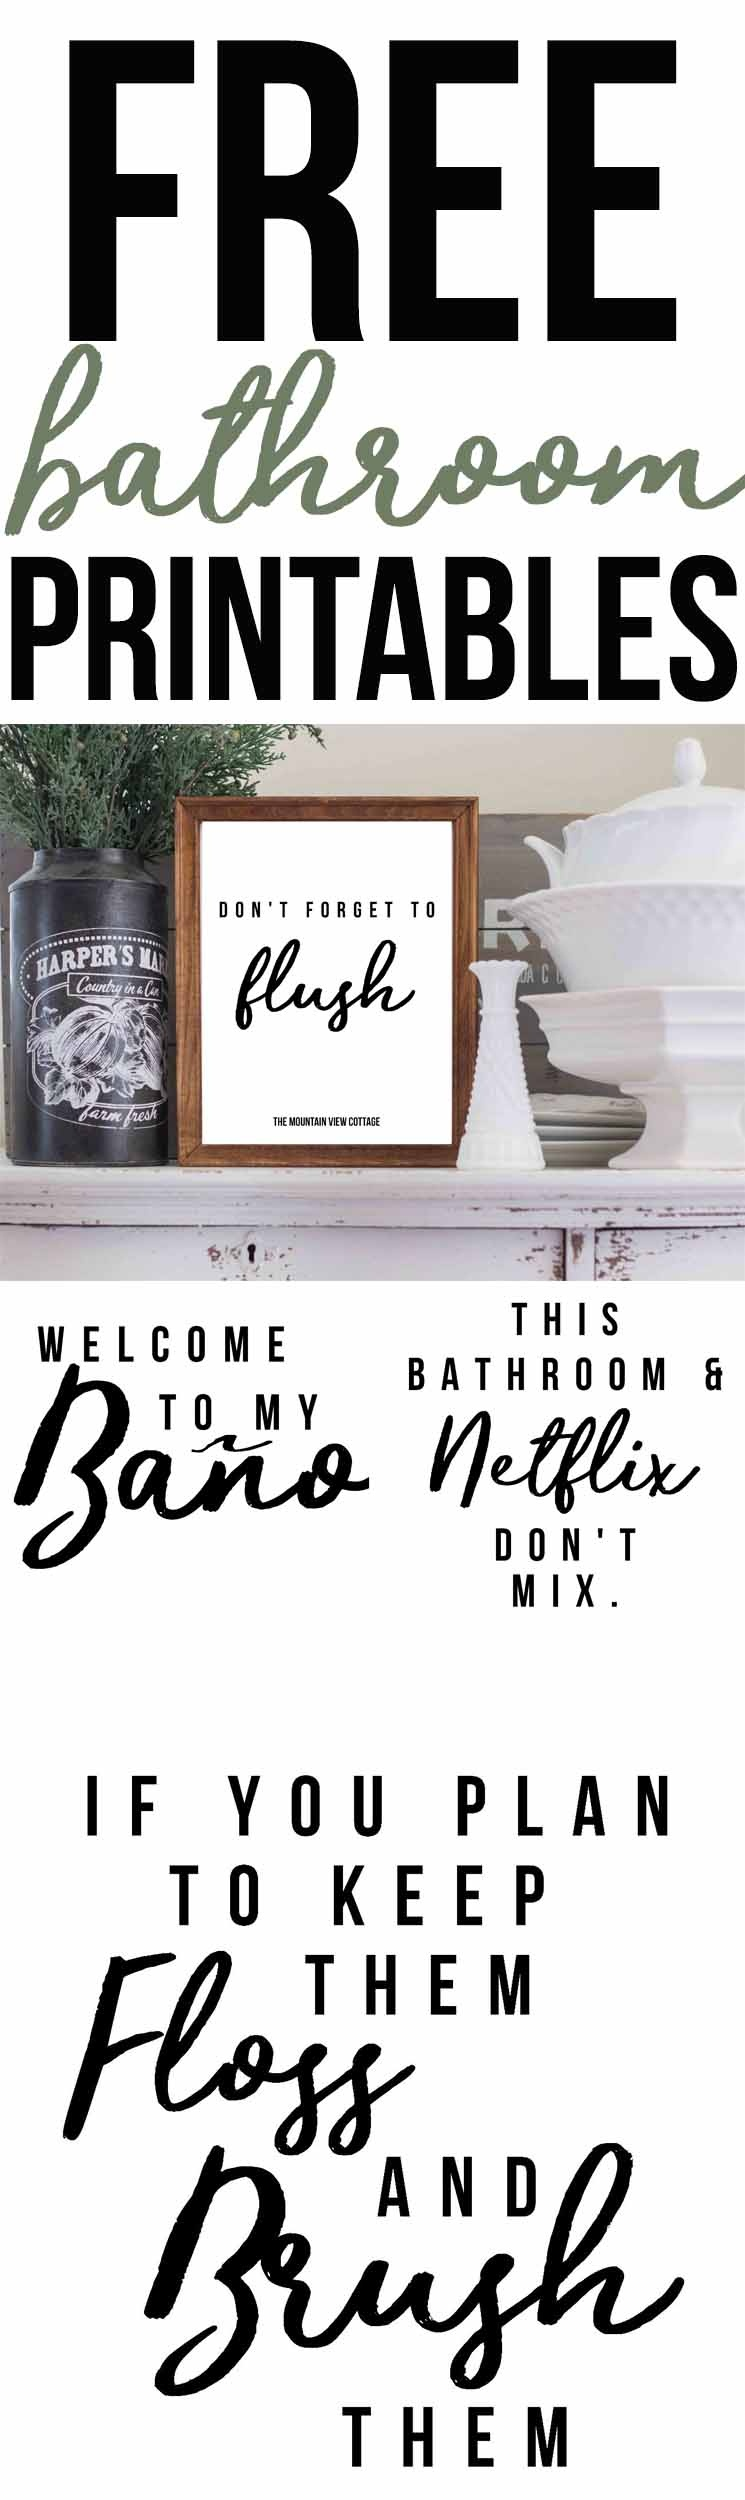 Free Bathroom Printables-Farmhouse Printables - The Mountain View - Free Bathroom Printables